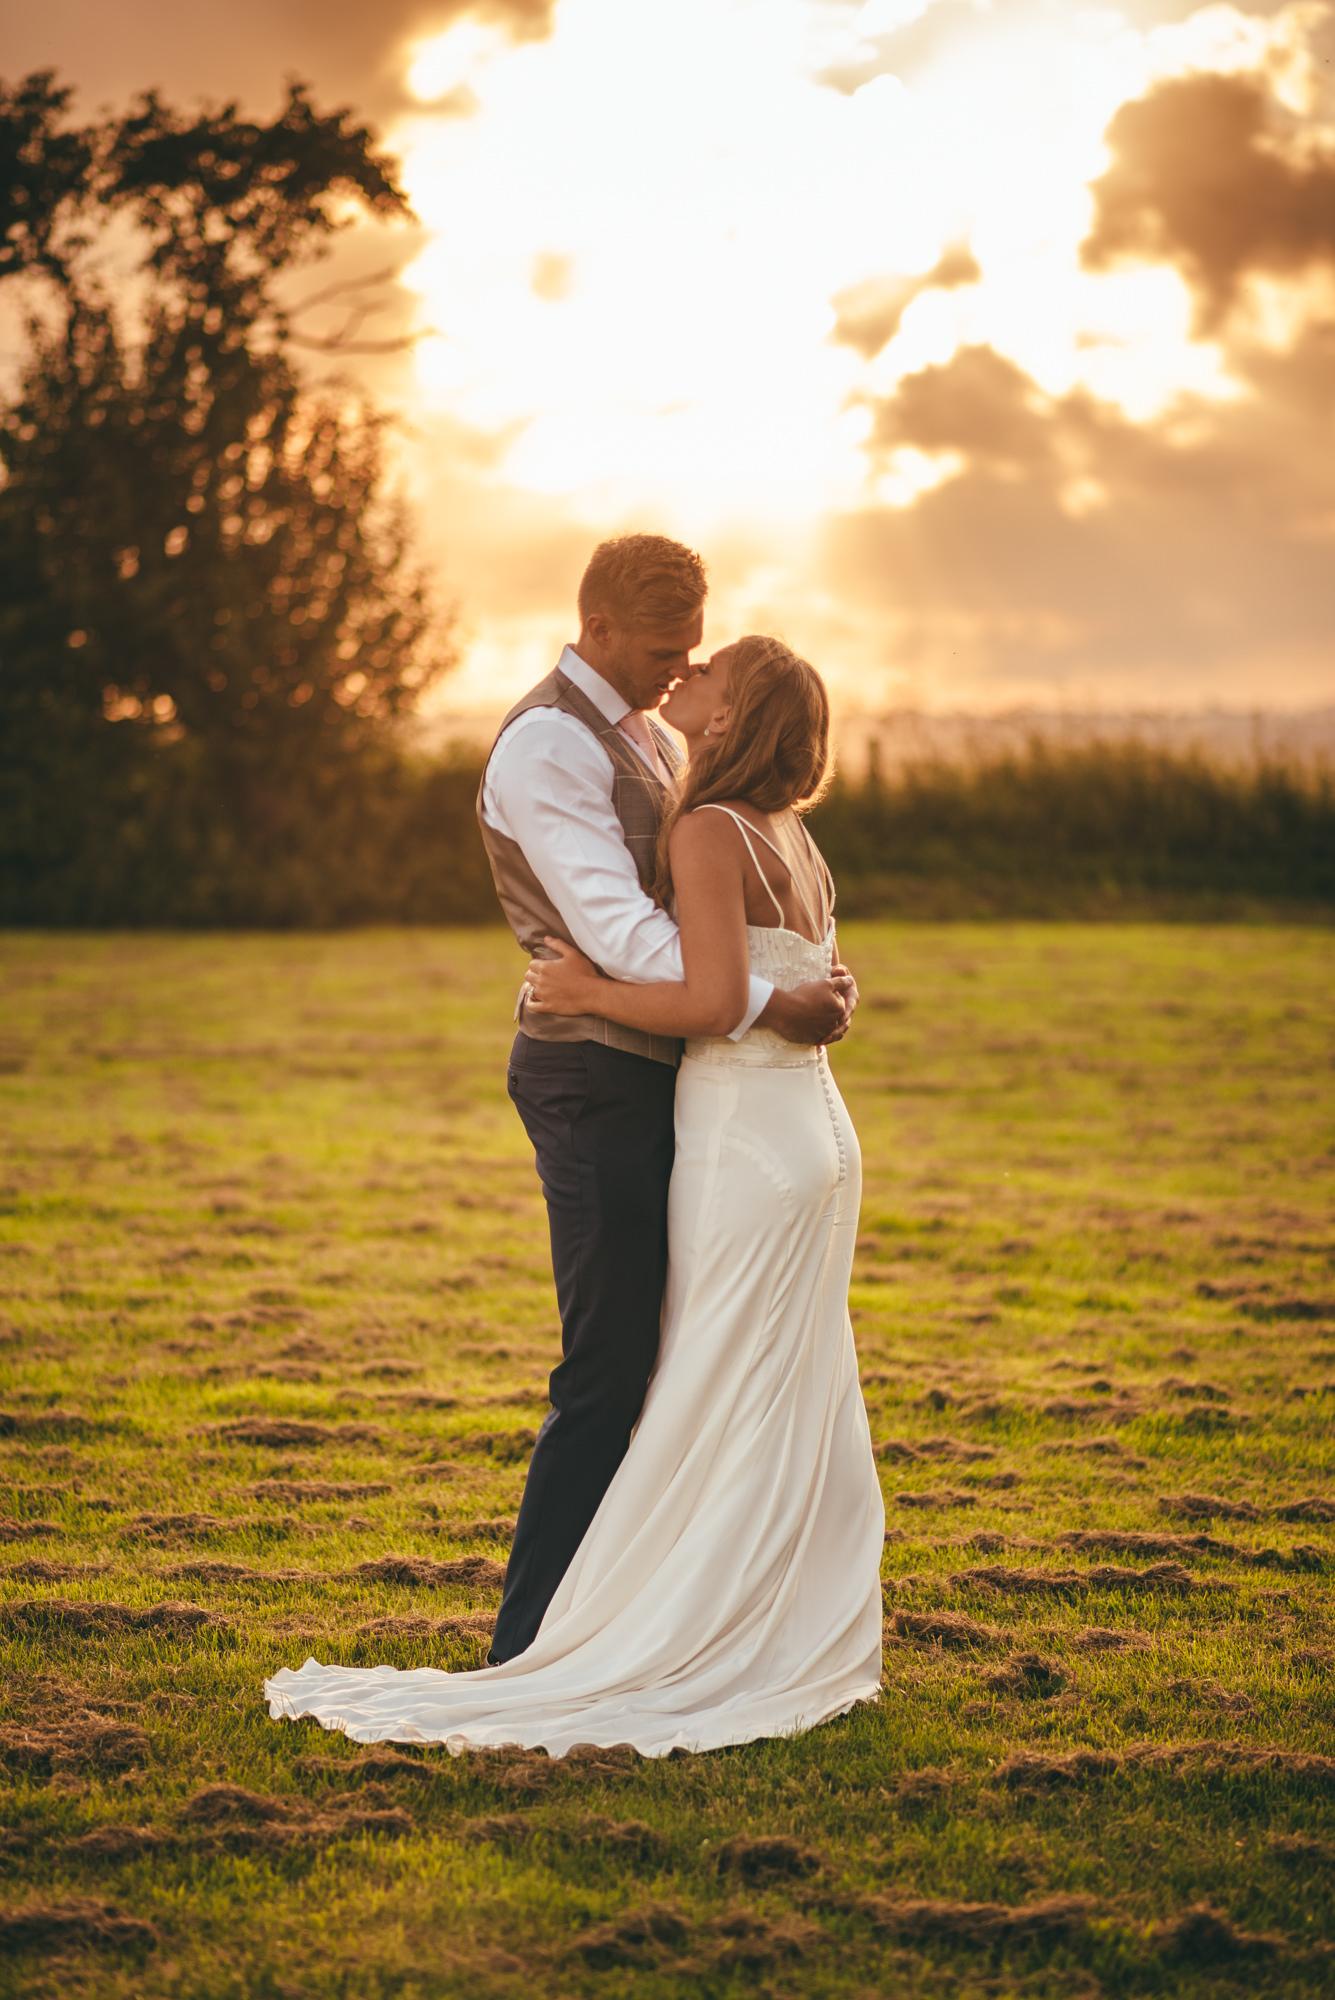 rutland-wedding-photographer-3.jpg-001.jpg